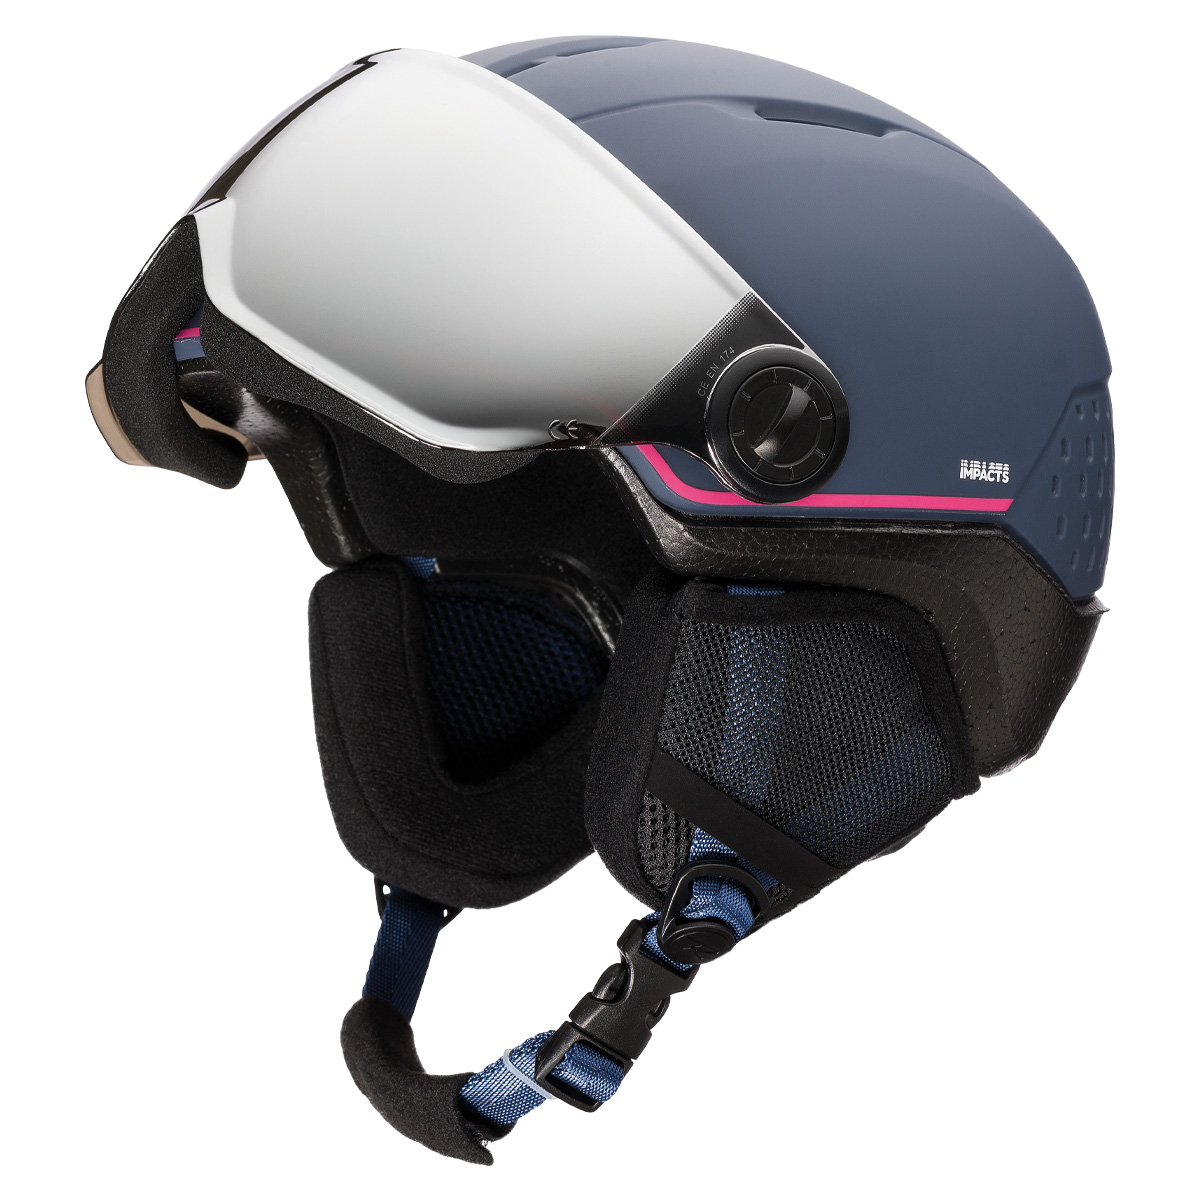 Casco sci Rossignol Whoopee Visor Impacts (Colore: blu-pink, Taglia: 49/52)